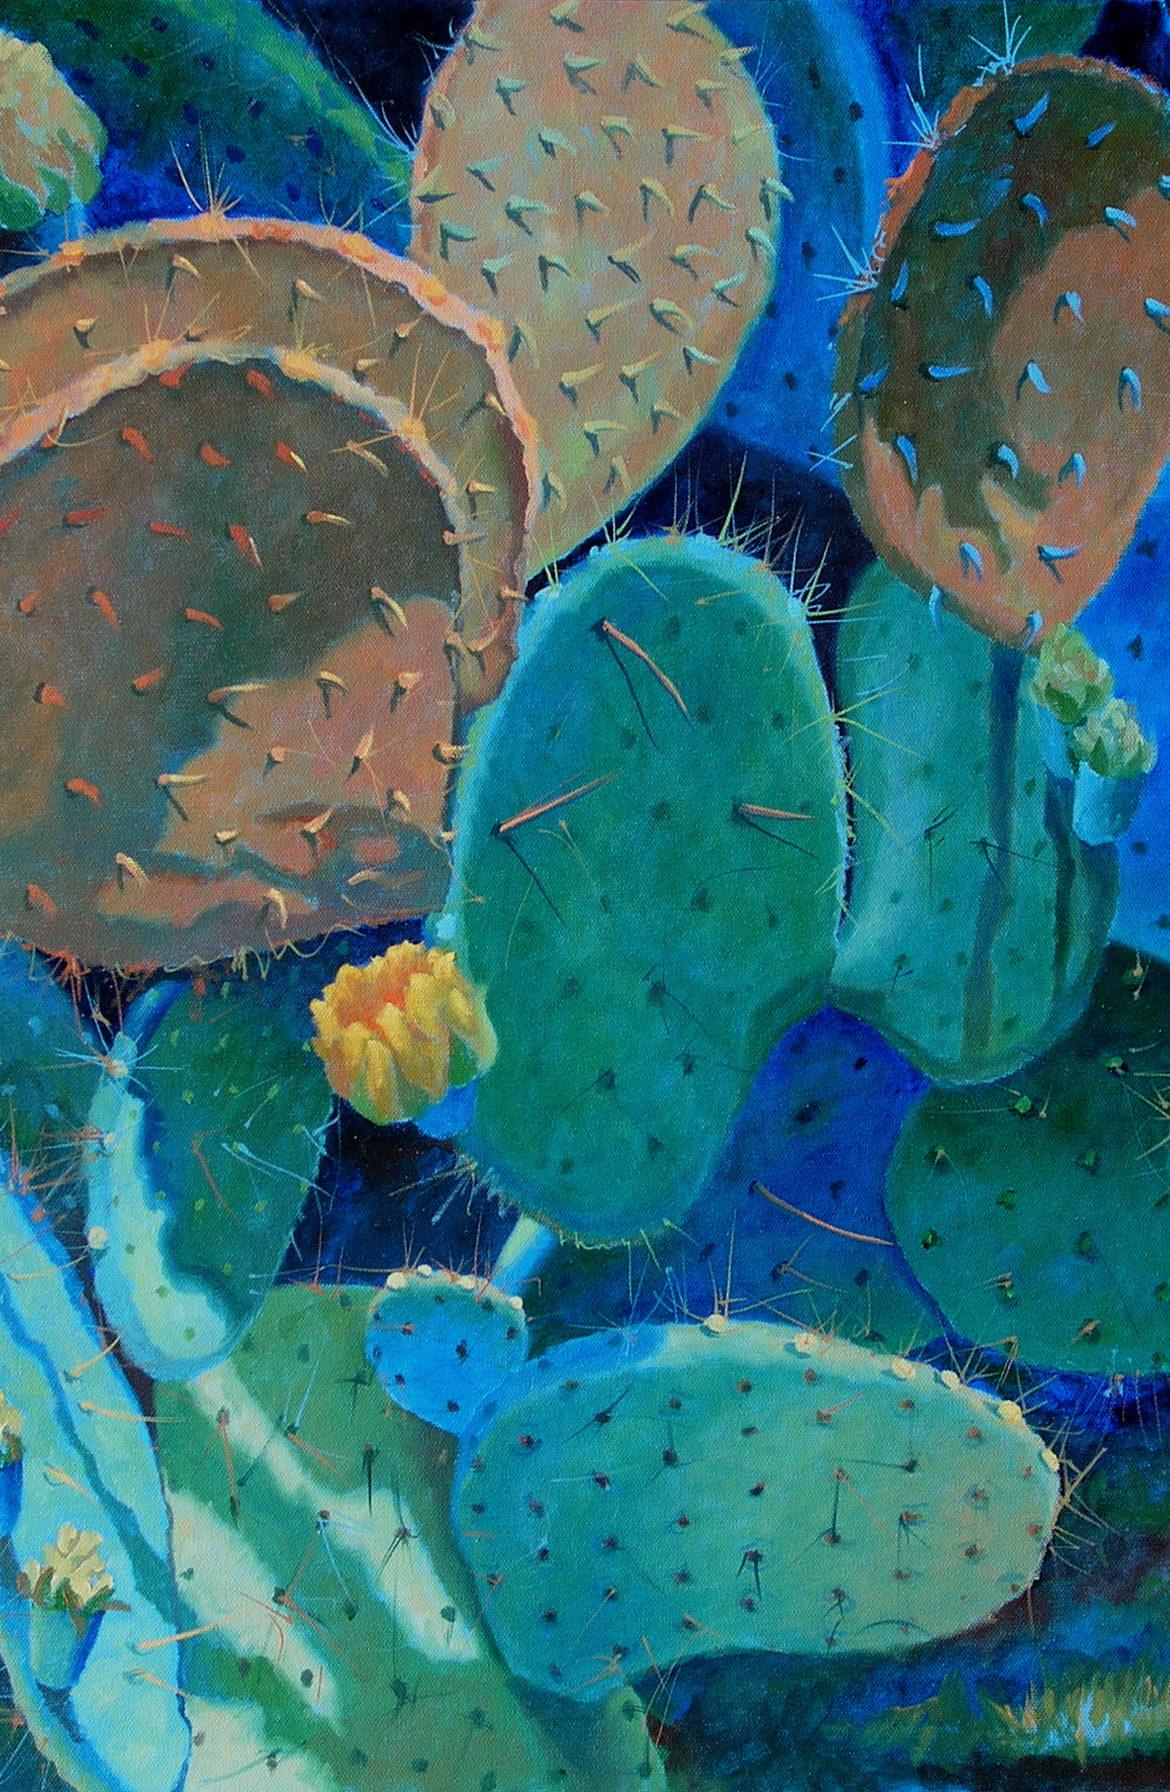 Prickly Pear Pattern, Sharon Weiser, Rogoway Gallery